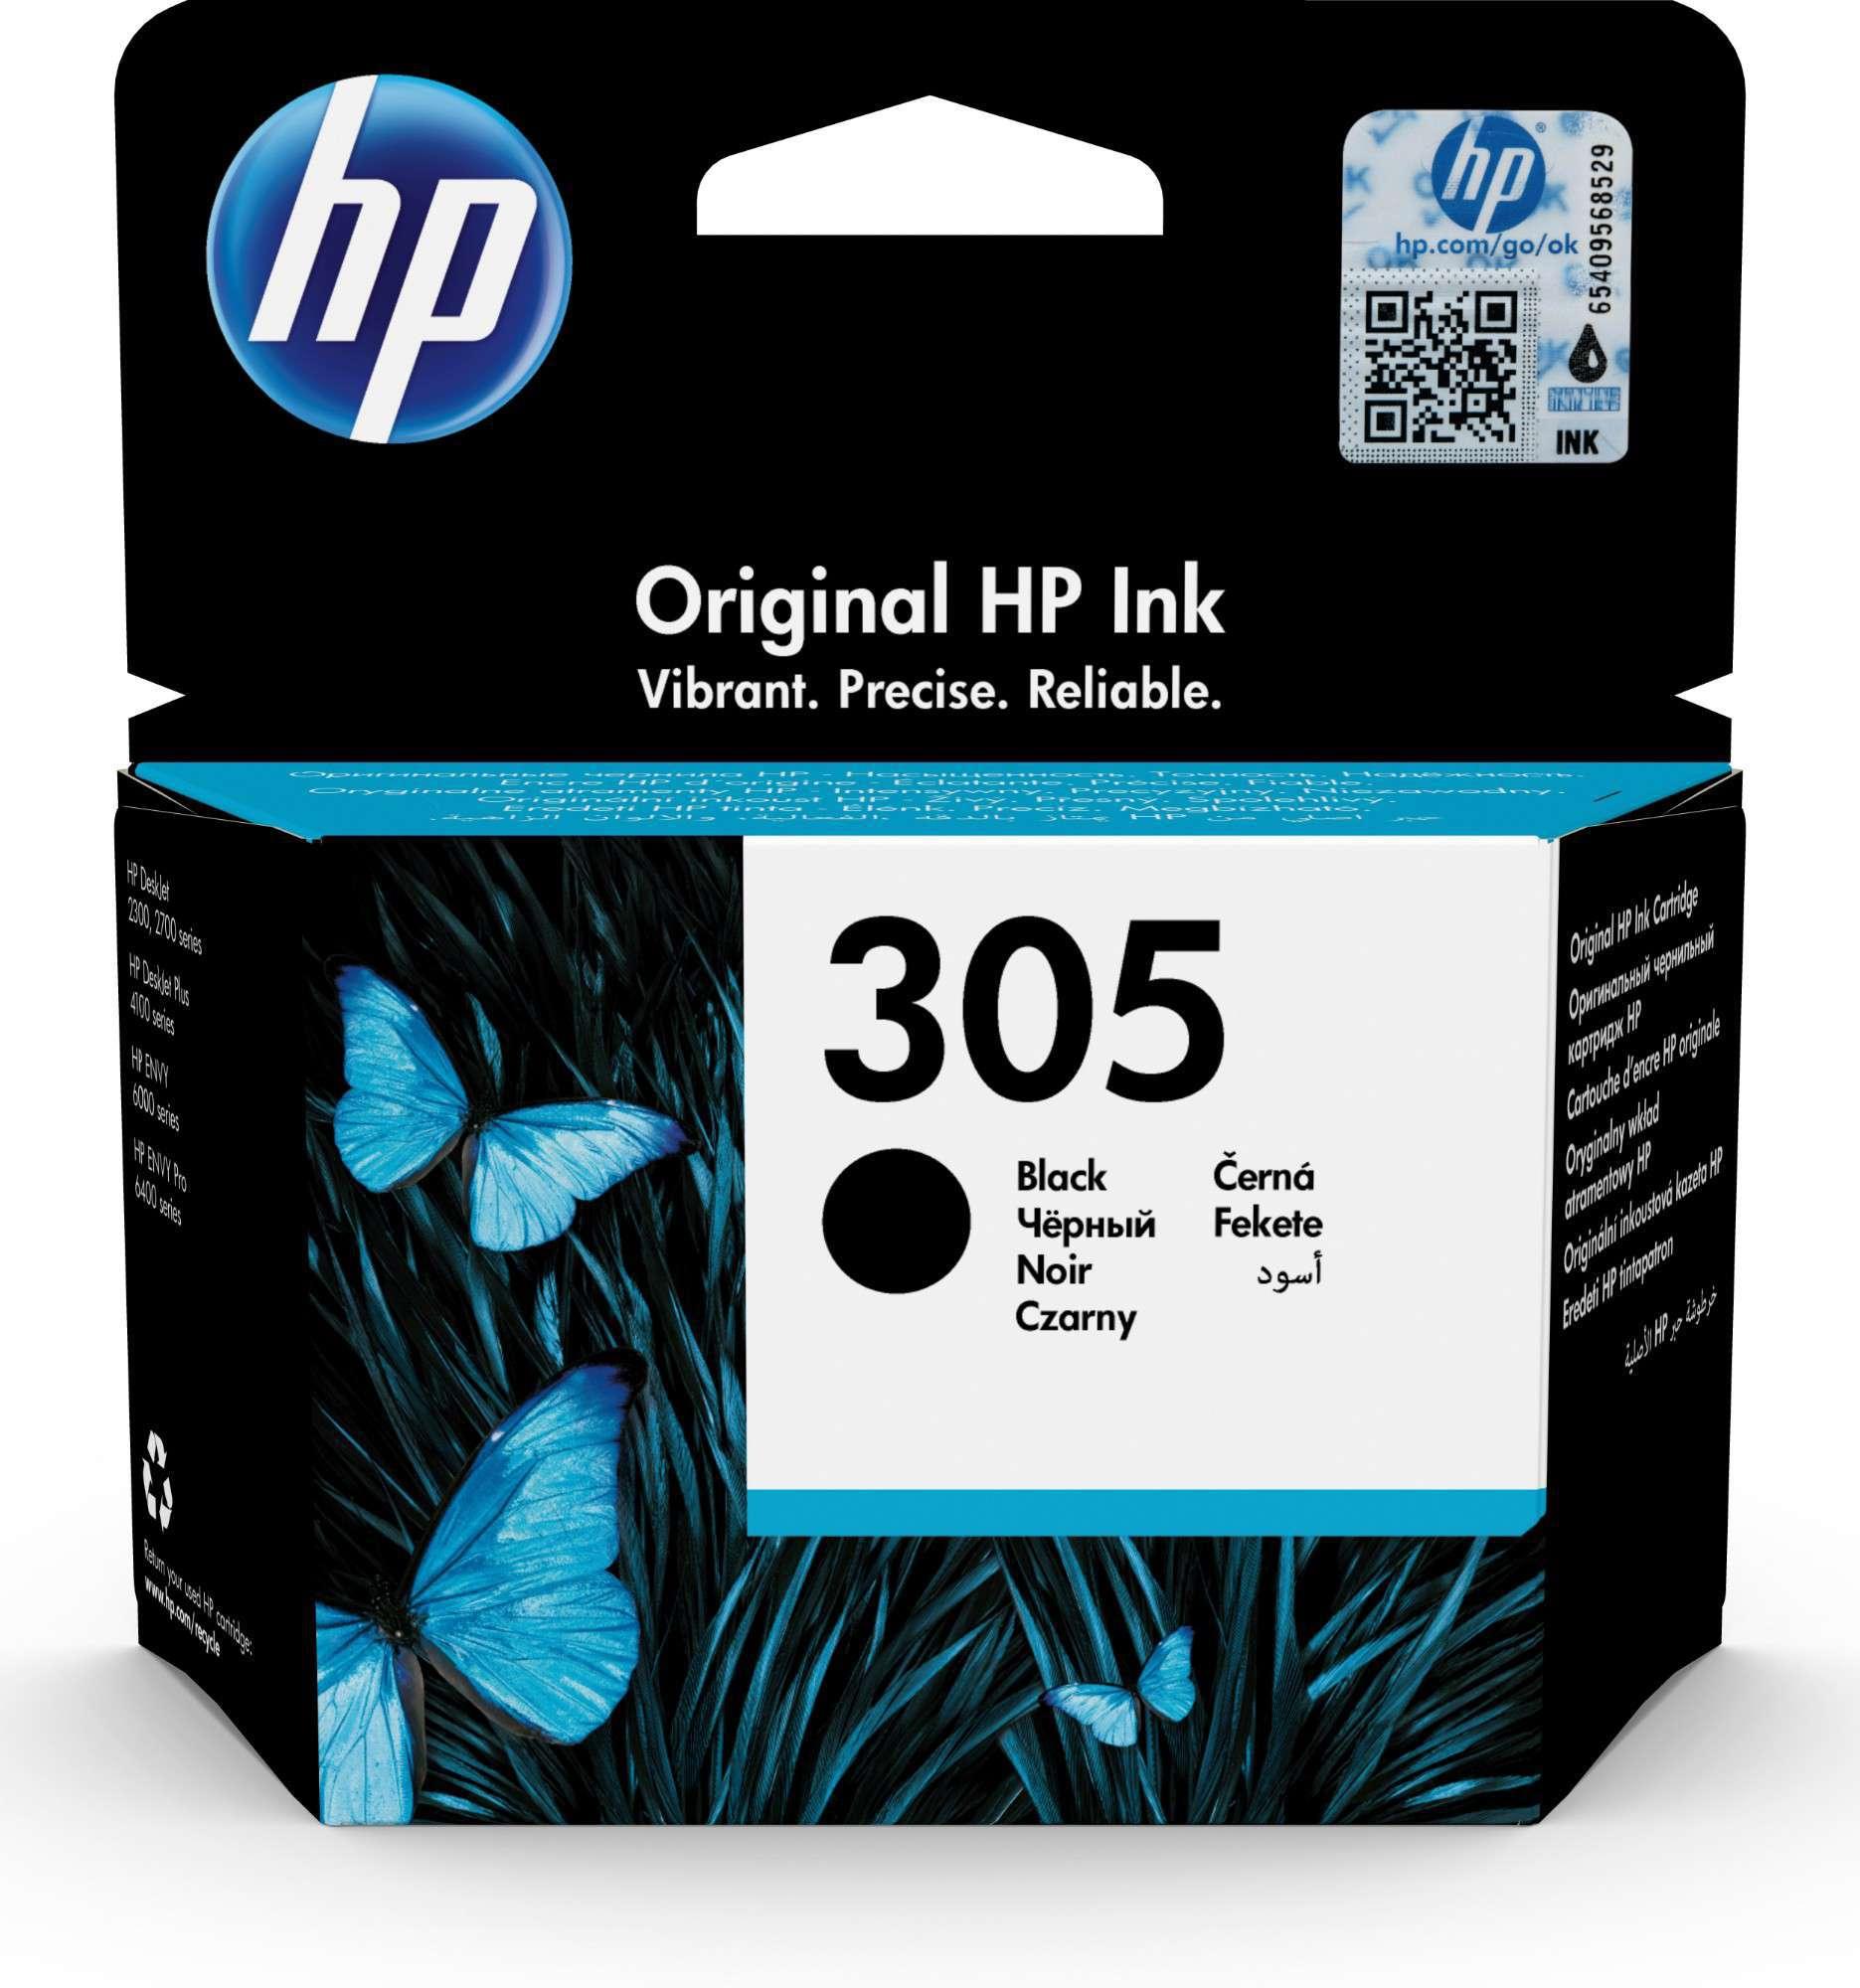 HP Original 305 Black Inkjet Cartridge 3YM61AE